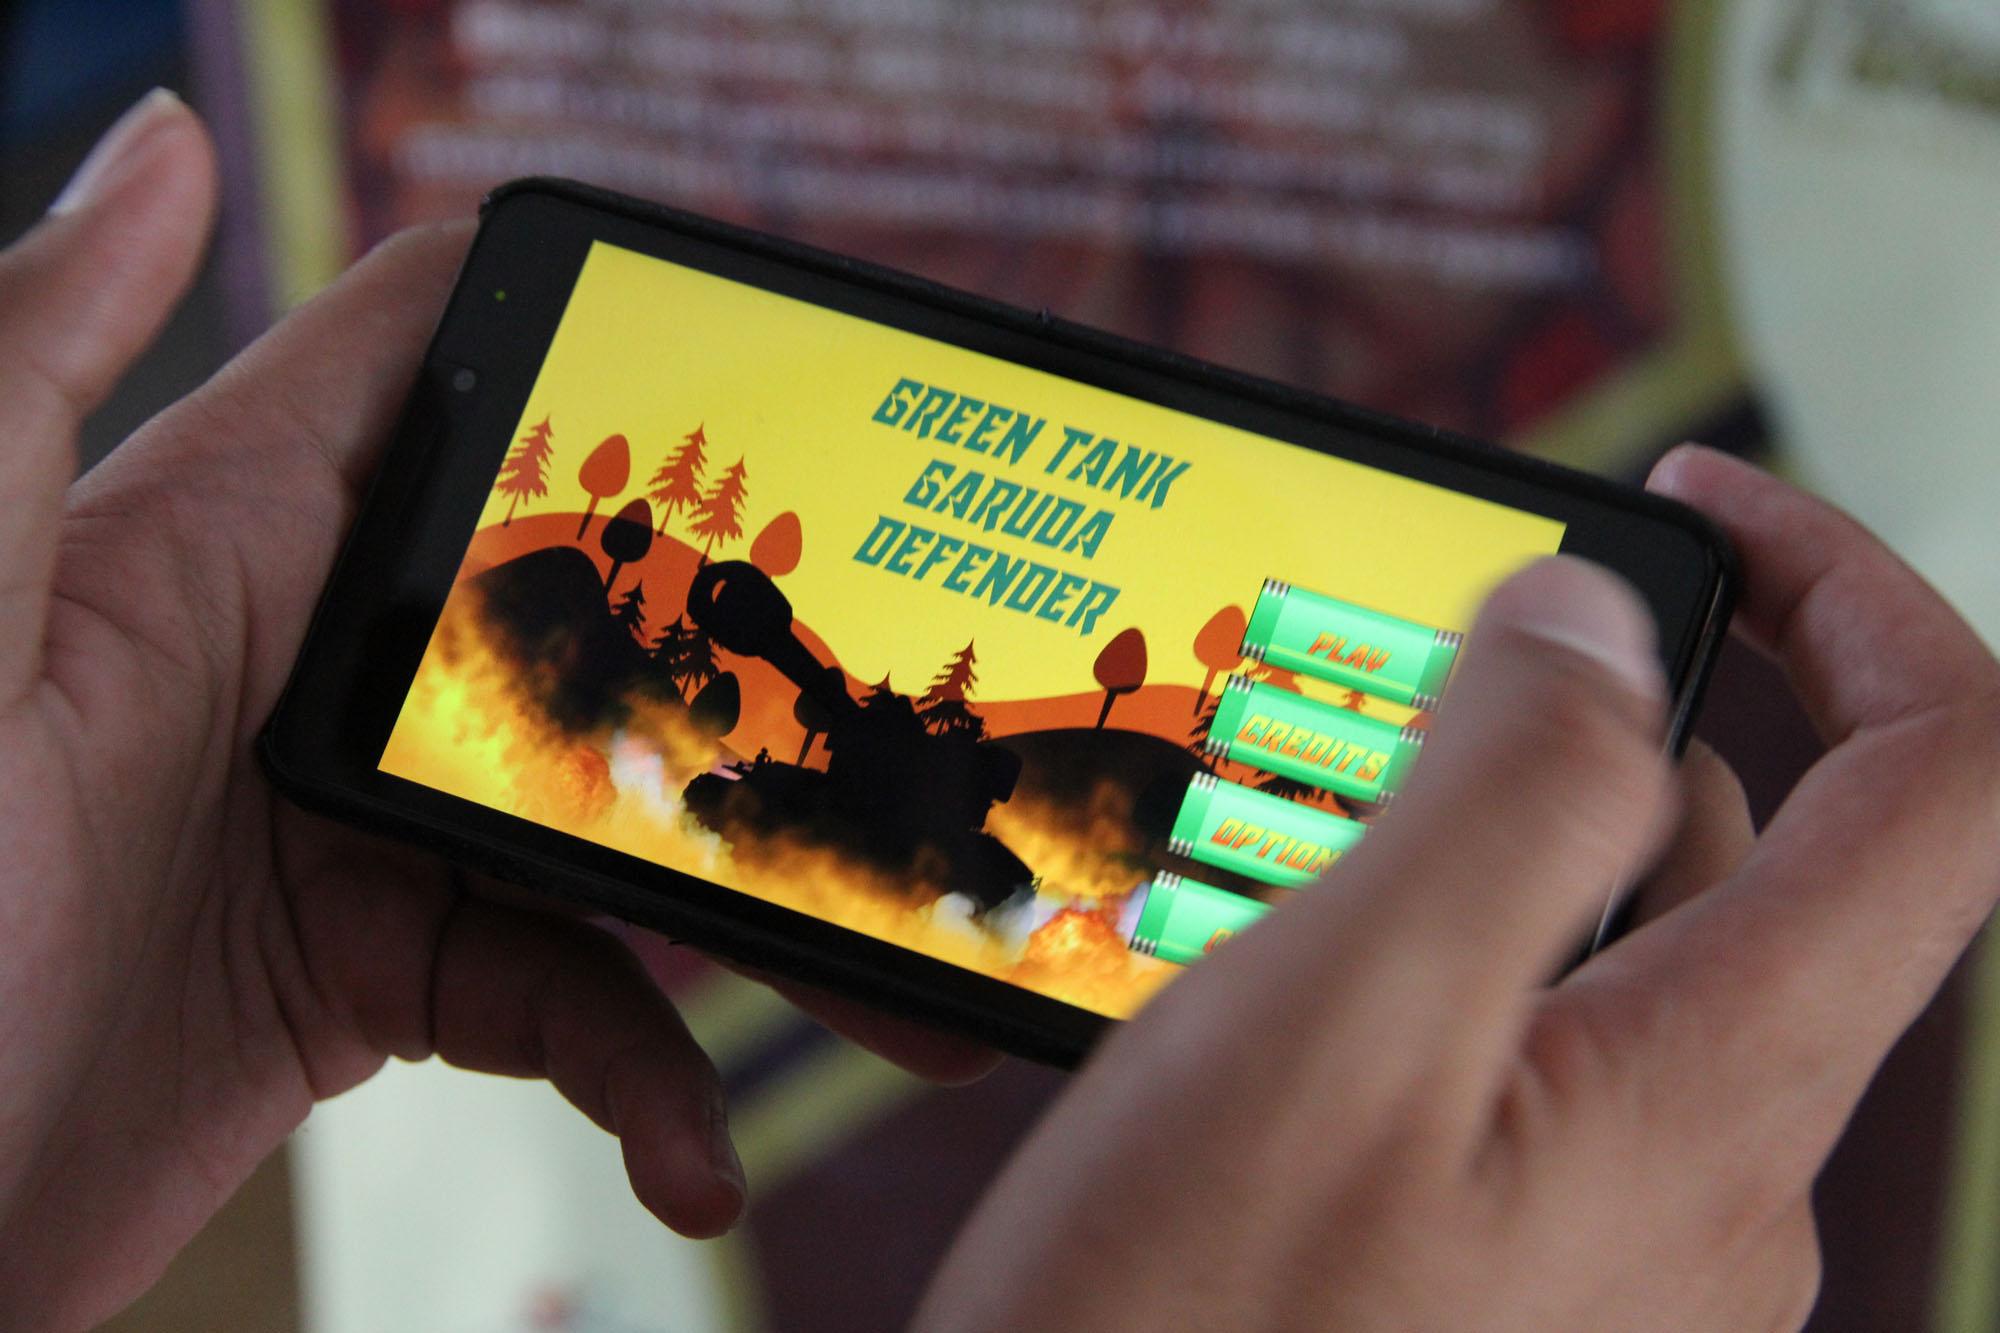 Angkat Kearifan Lokal,  Mahasiswa Desain Teknologi Permainan Gelar Pameran Karya